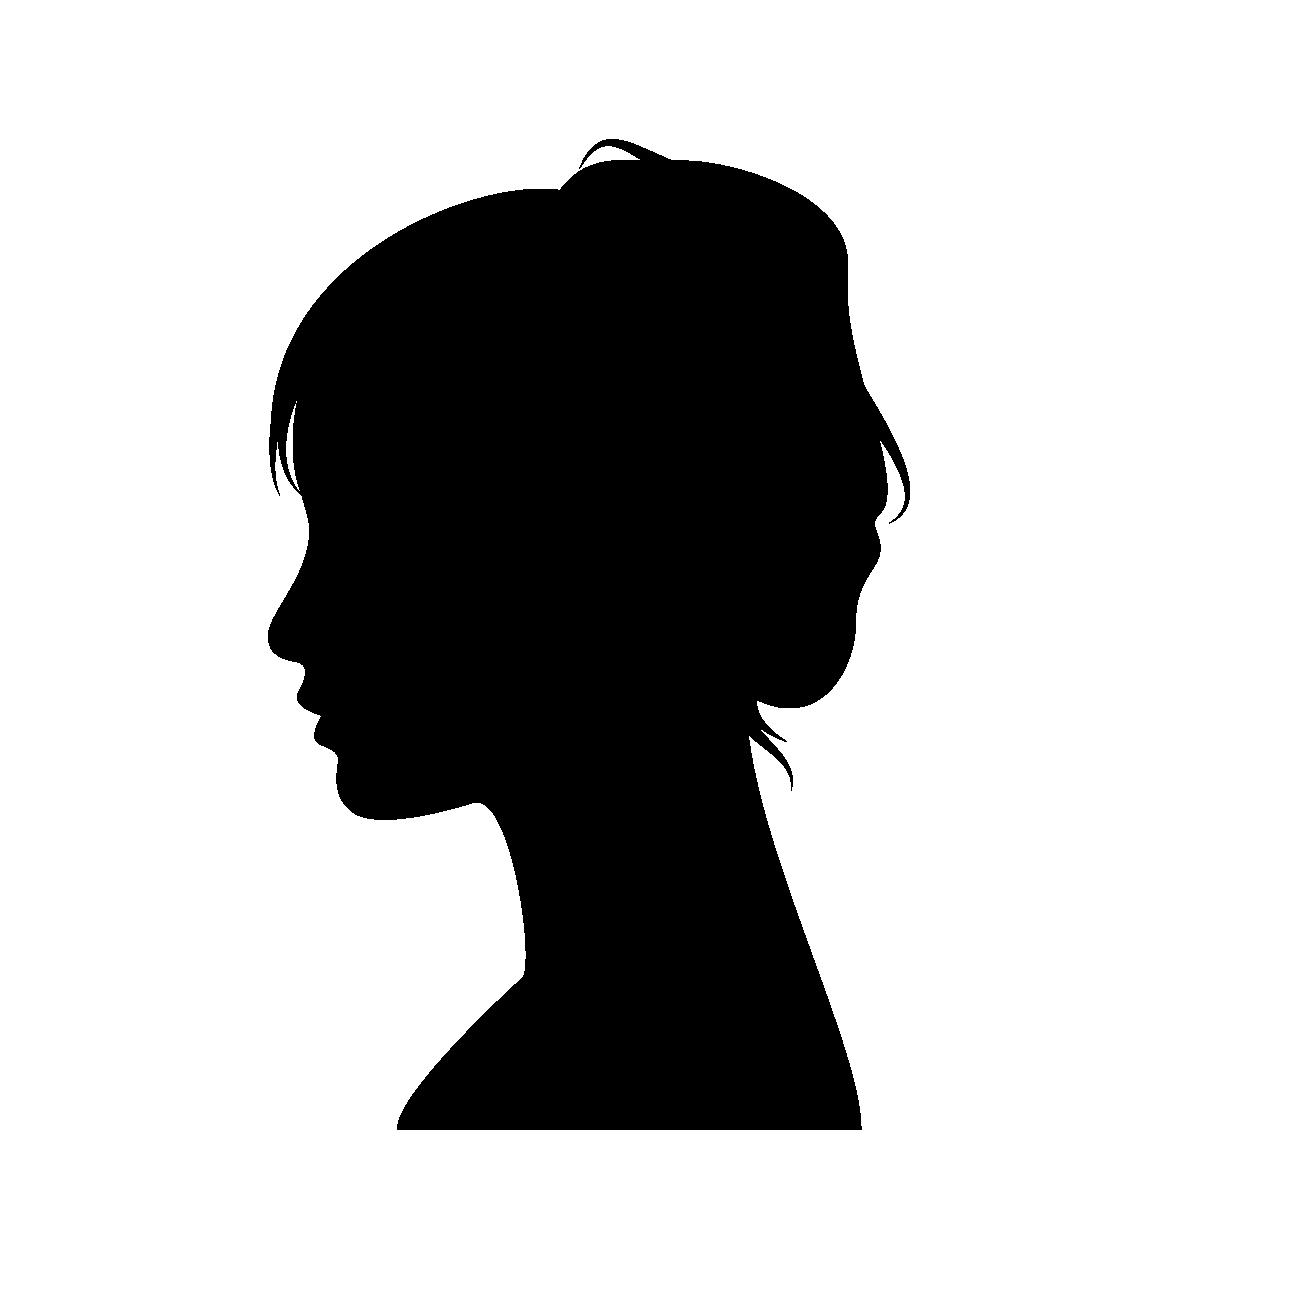 後輩の同僚(女性)